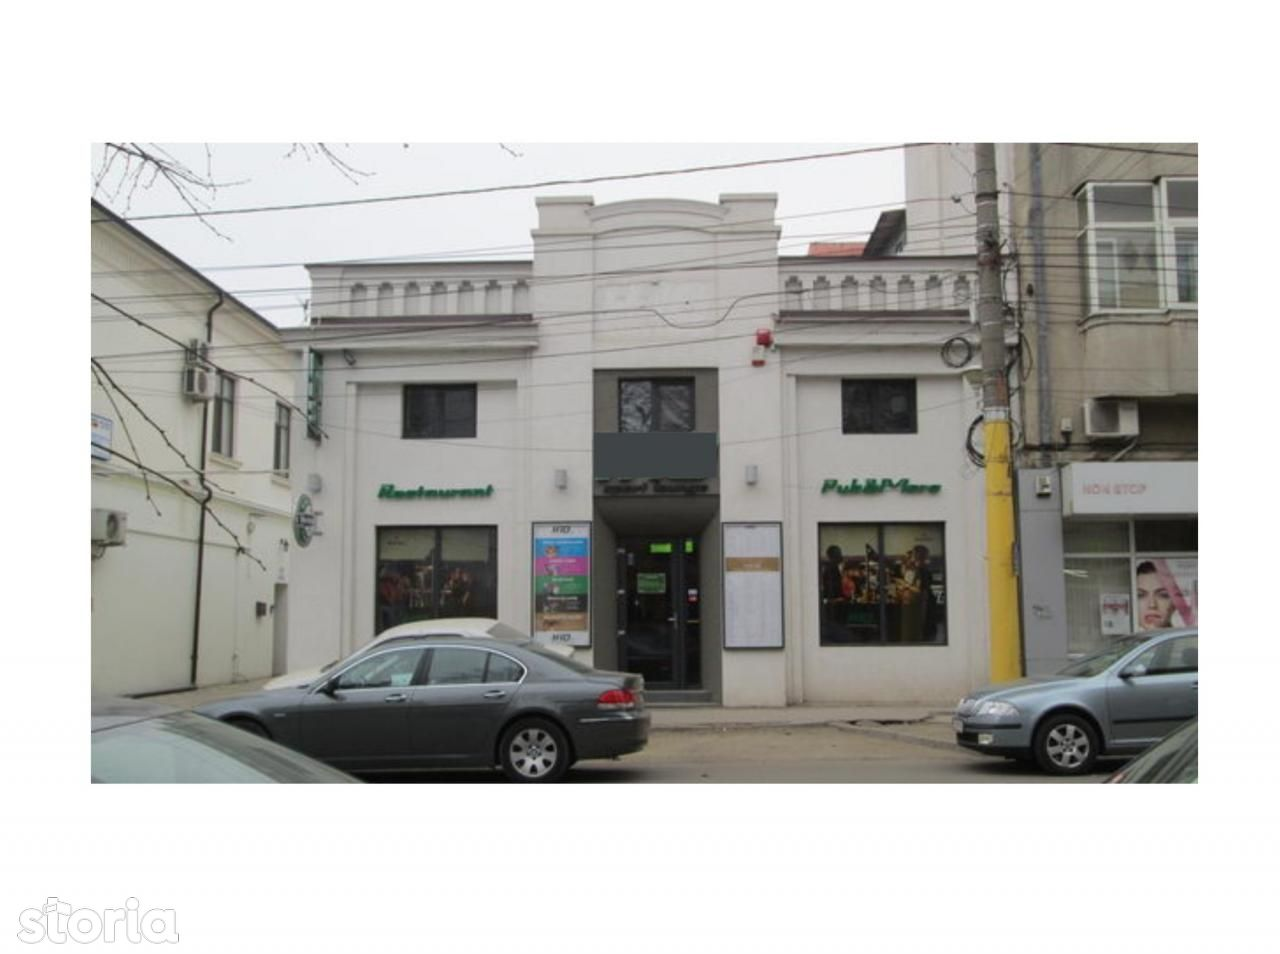 Spatiu Comercial de inchiriat, Constanța (judet), Bulevardul Tomis - Foto 1